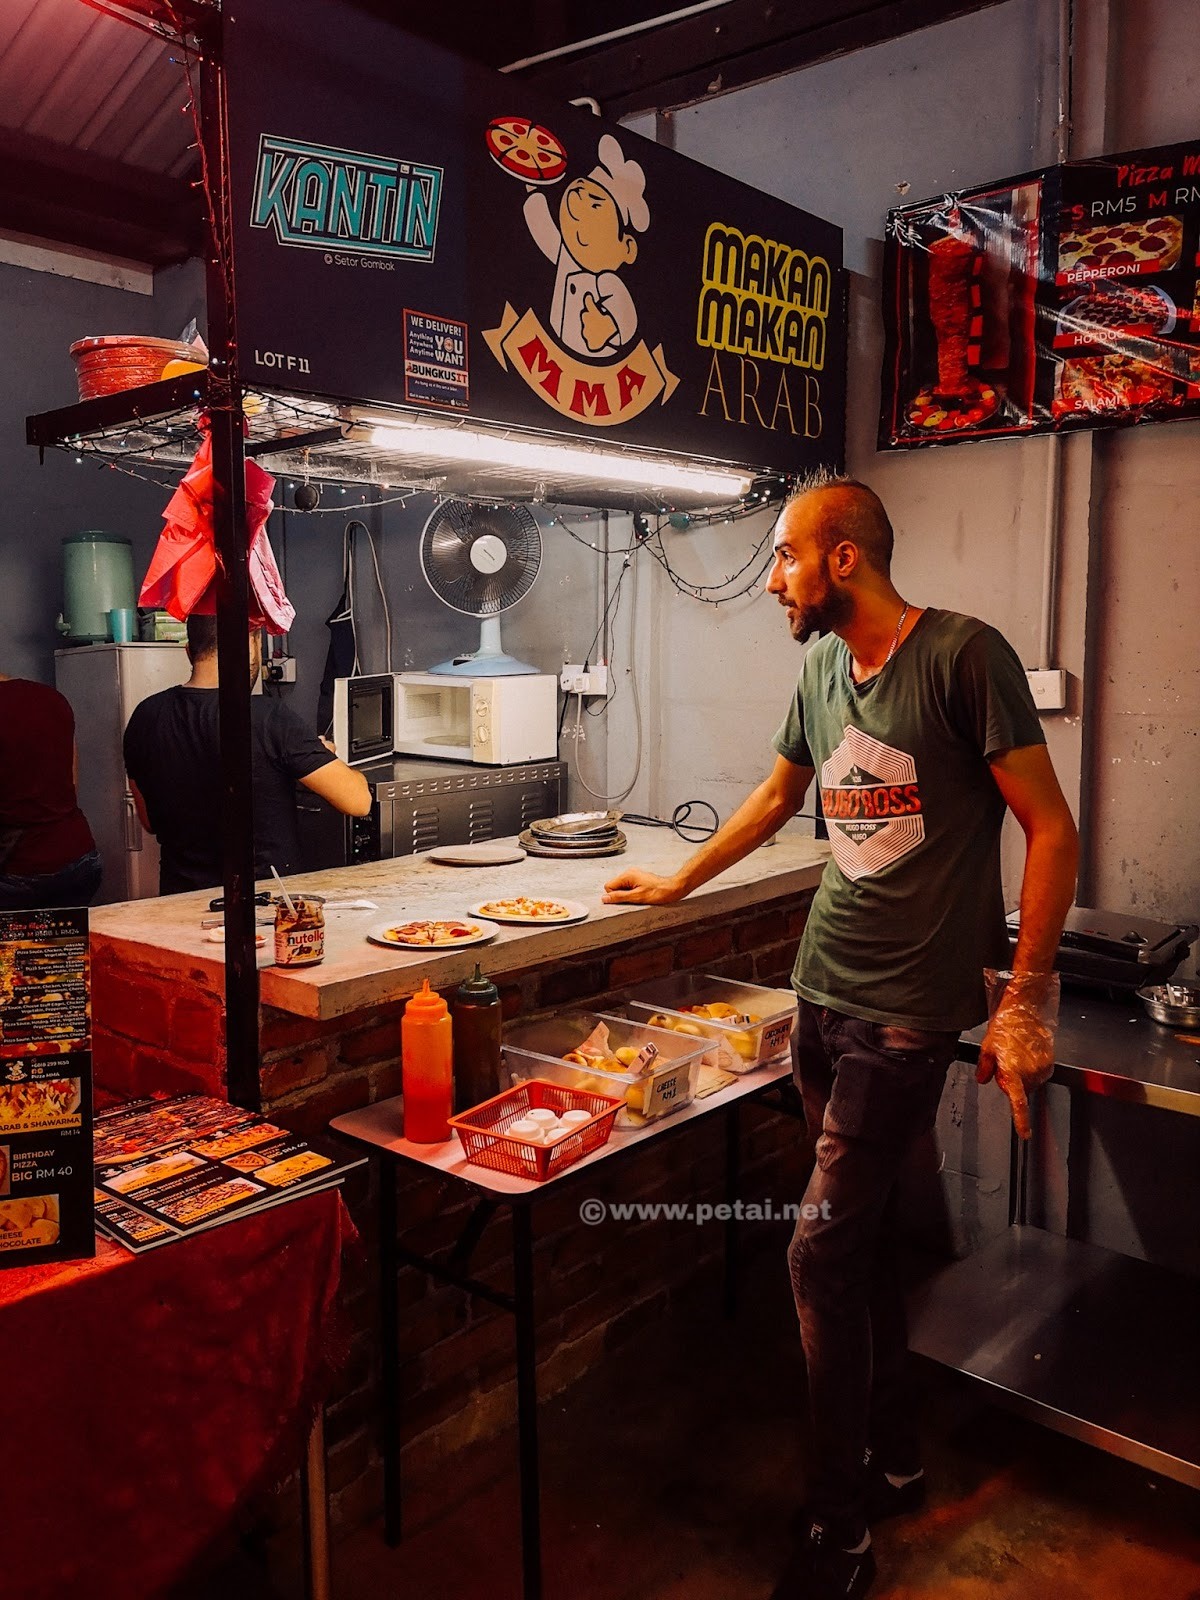 Kantin @ Setor Gombak - pizza